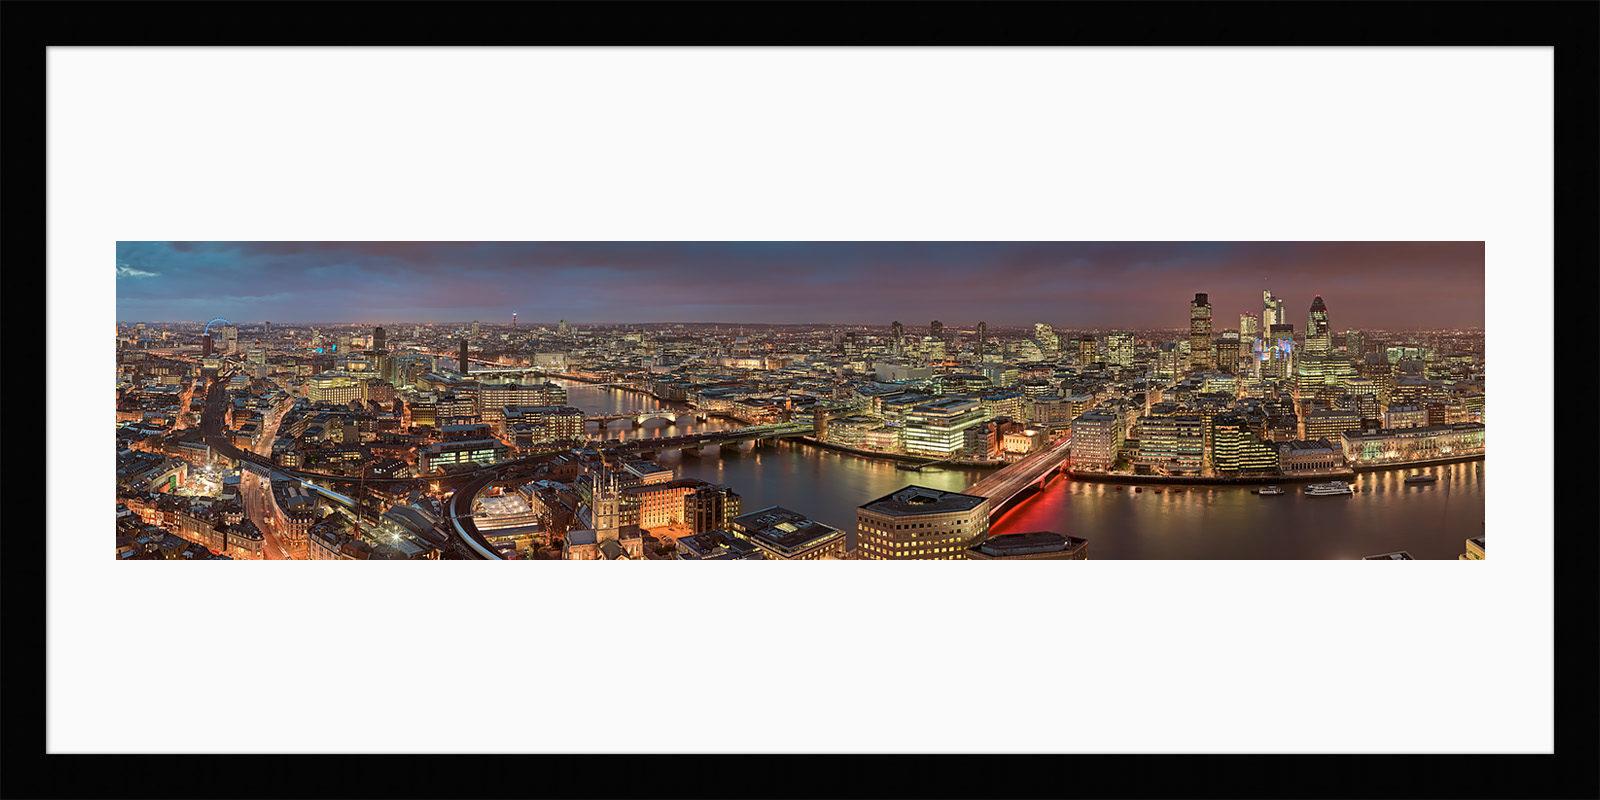 Shard View Night - Framed High-Res Fine Art Photograph